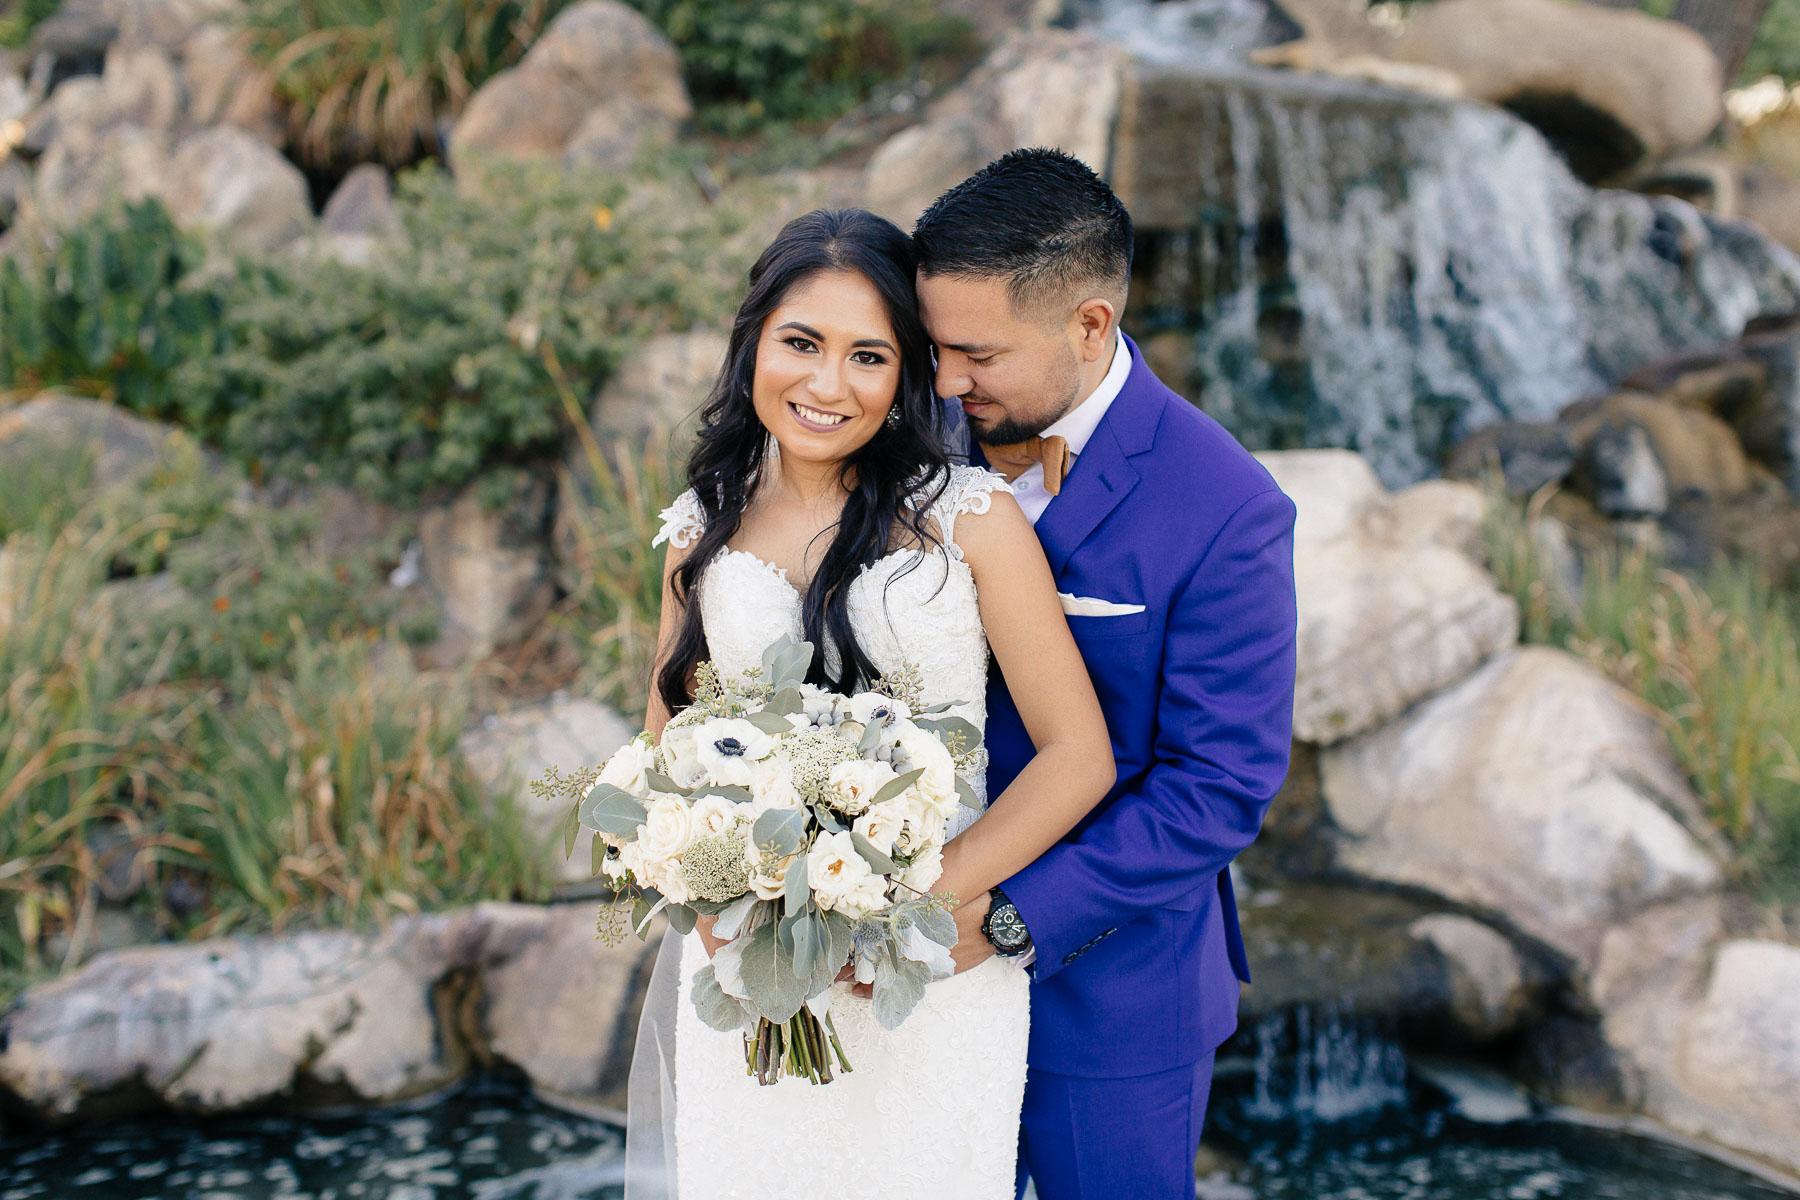 161029-Luxium-Weddings-Arizona-Jeff-Griselda-First-Look-Val-Vista-Lakes-Gilber-051.jpg